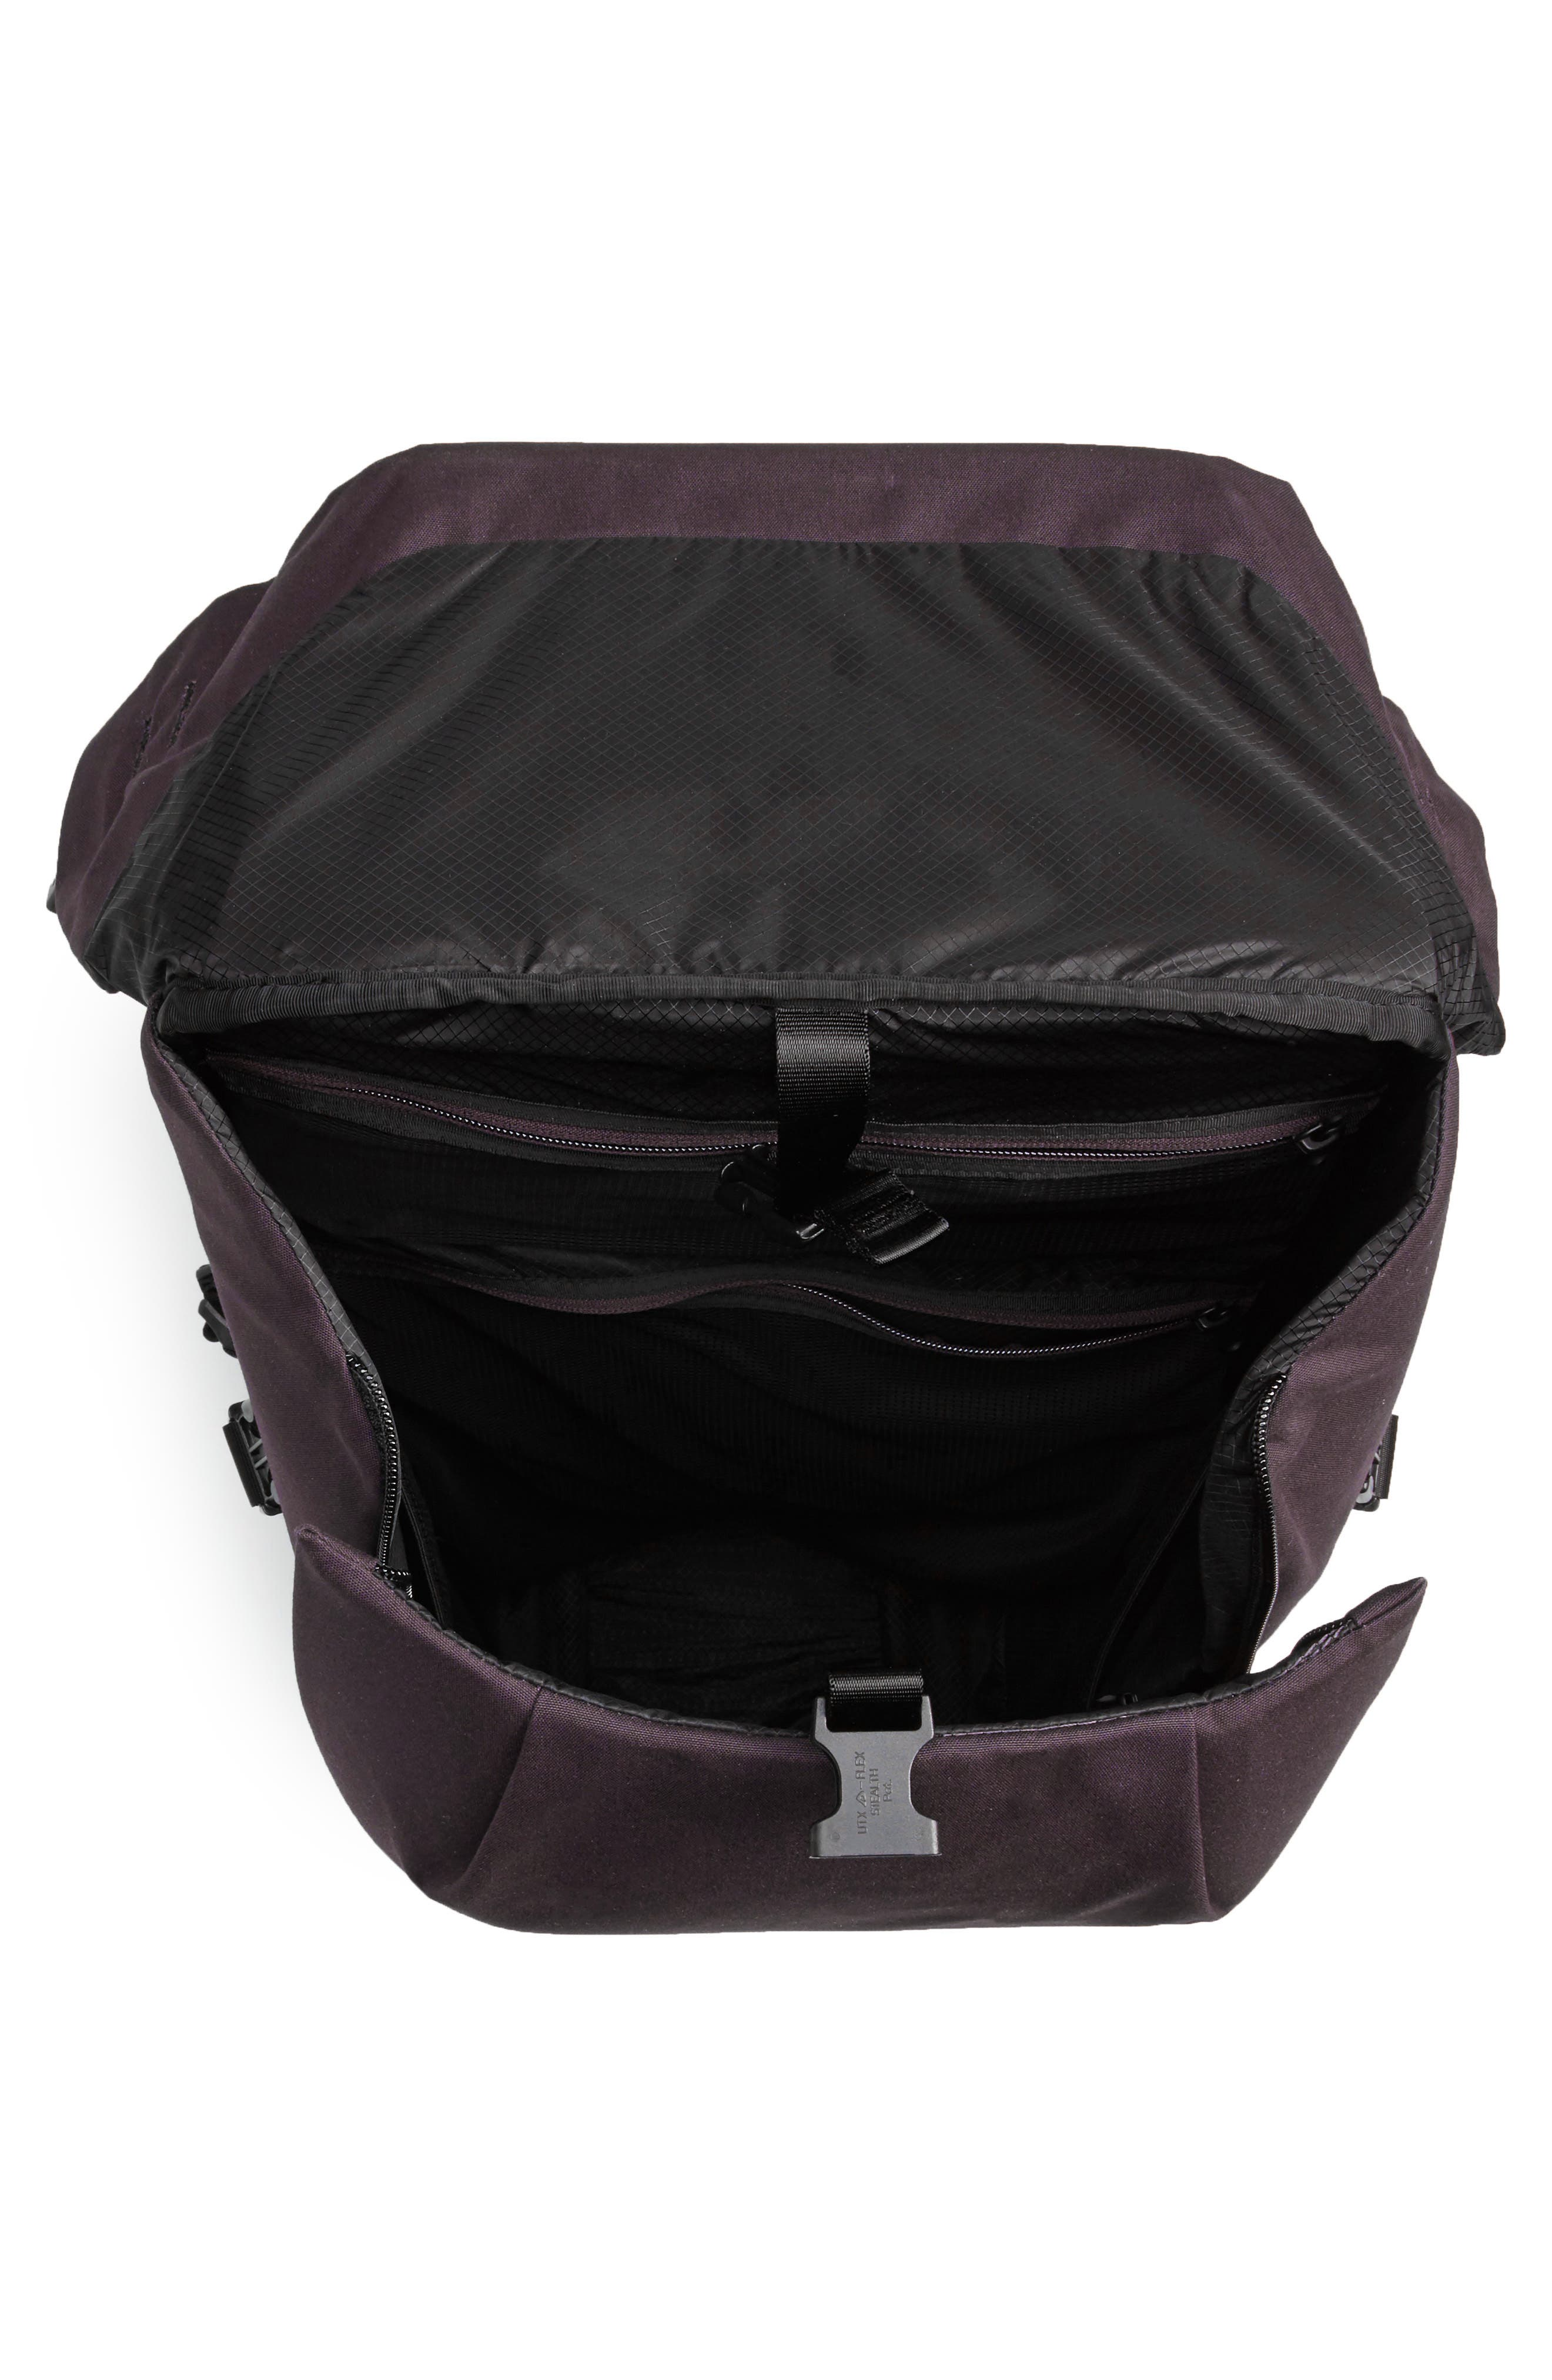 Locker Pack Lux Backpack,                             Alternate thumbnail 4, color,                             Port